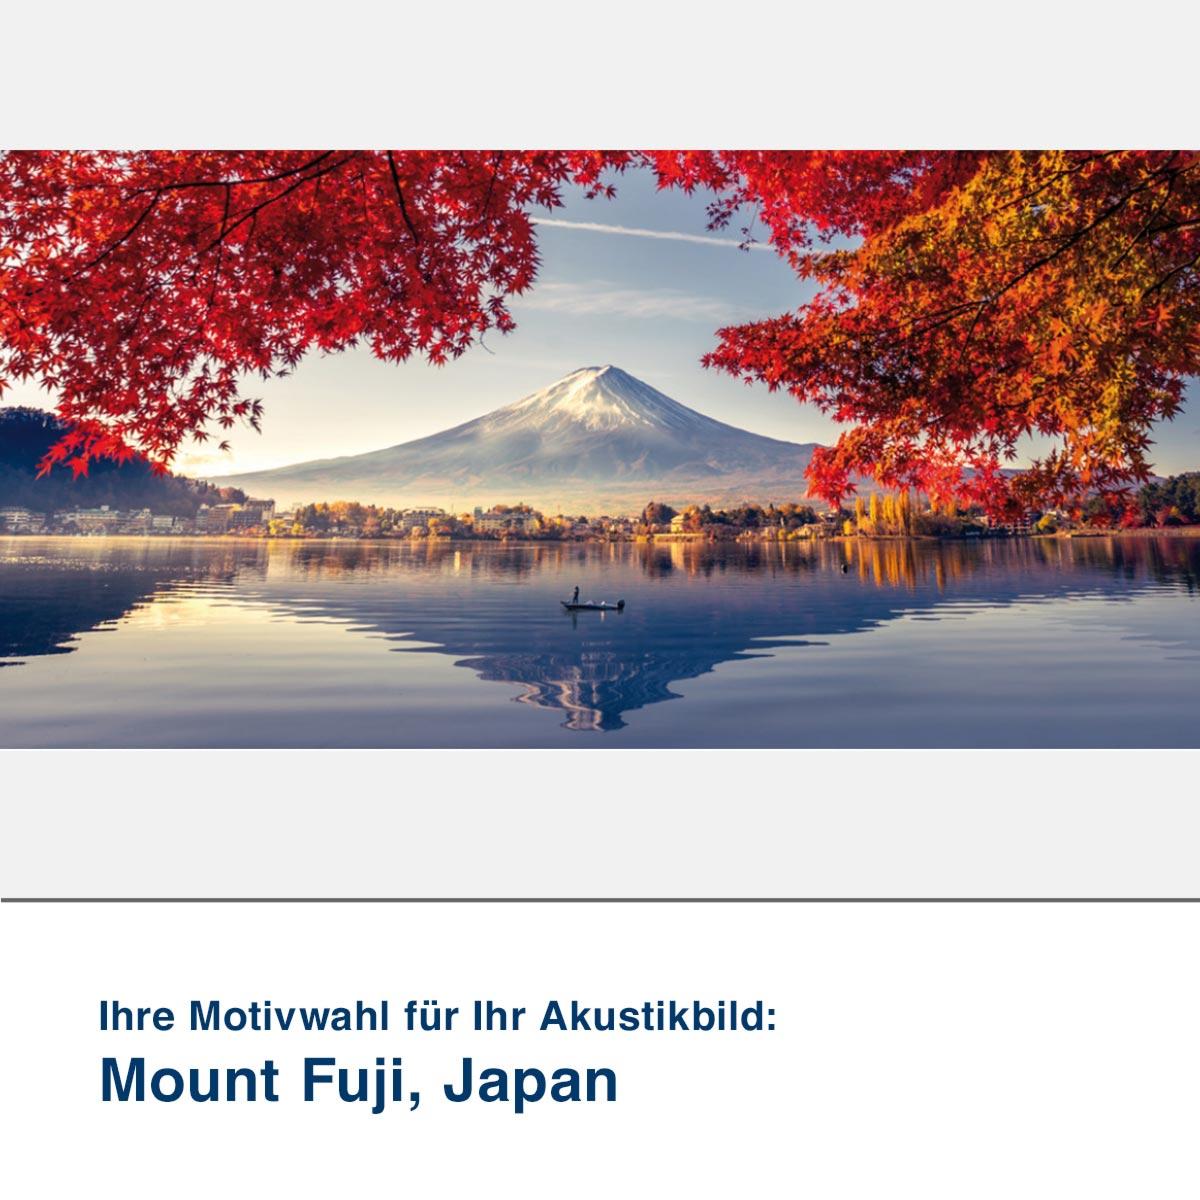 Akustikbild Motiv Mount Fuji, Japan